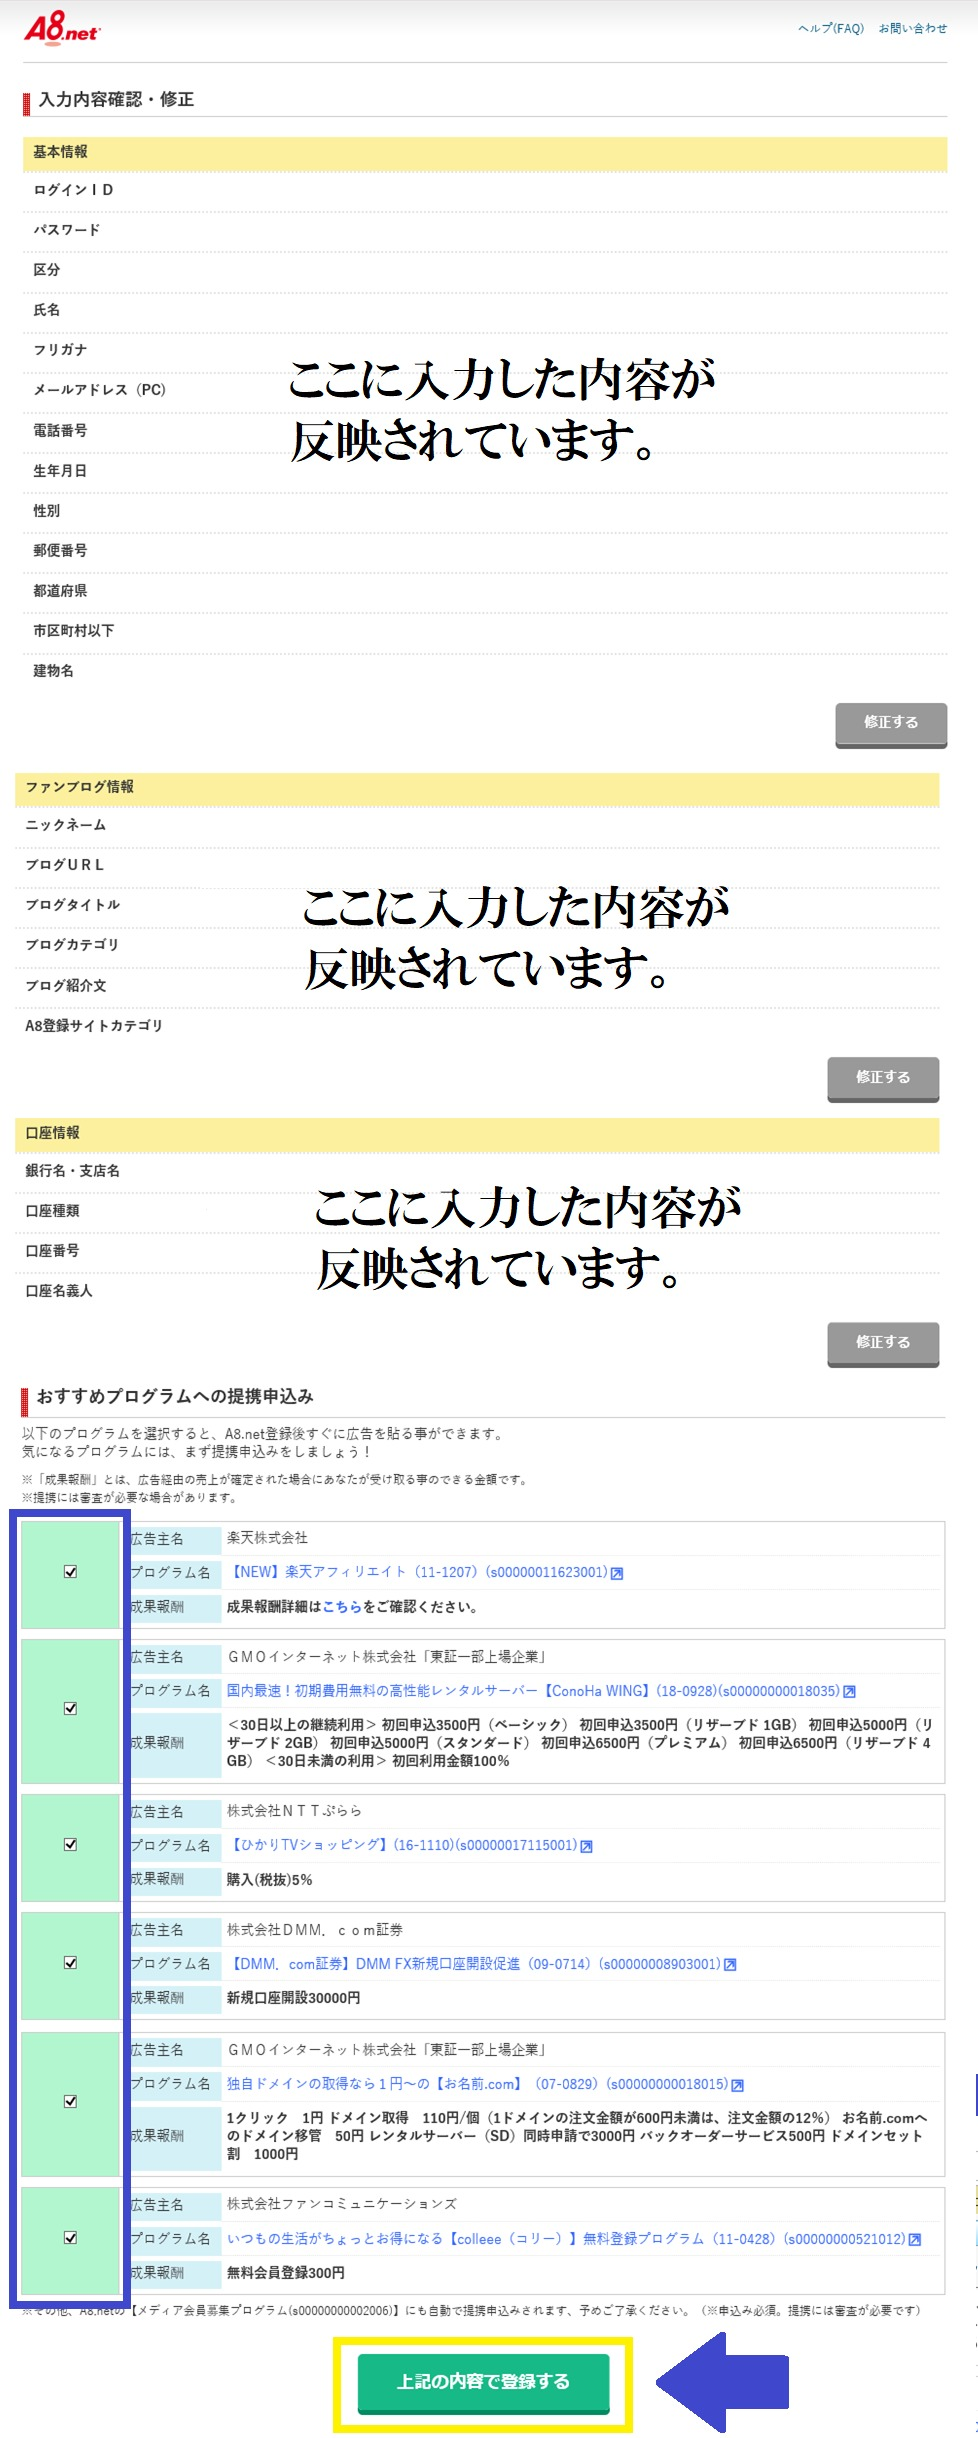 A8.net申し込み画面